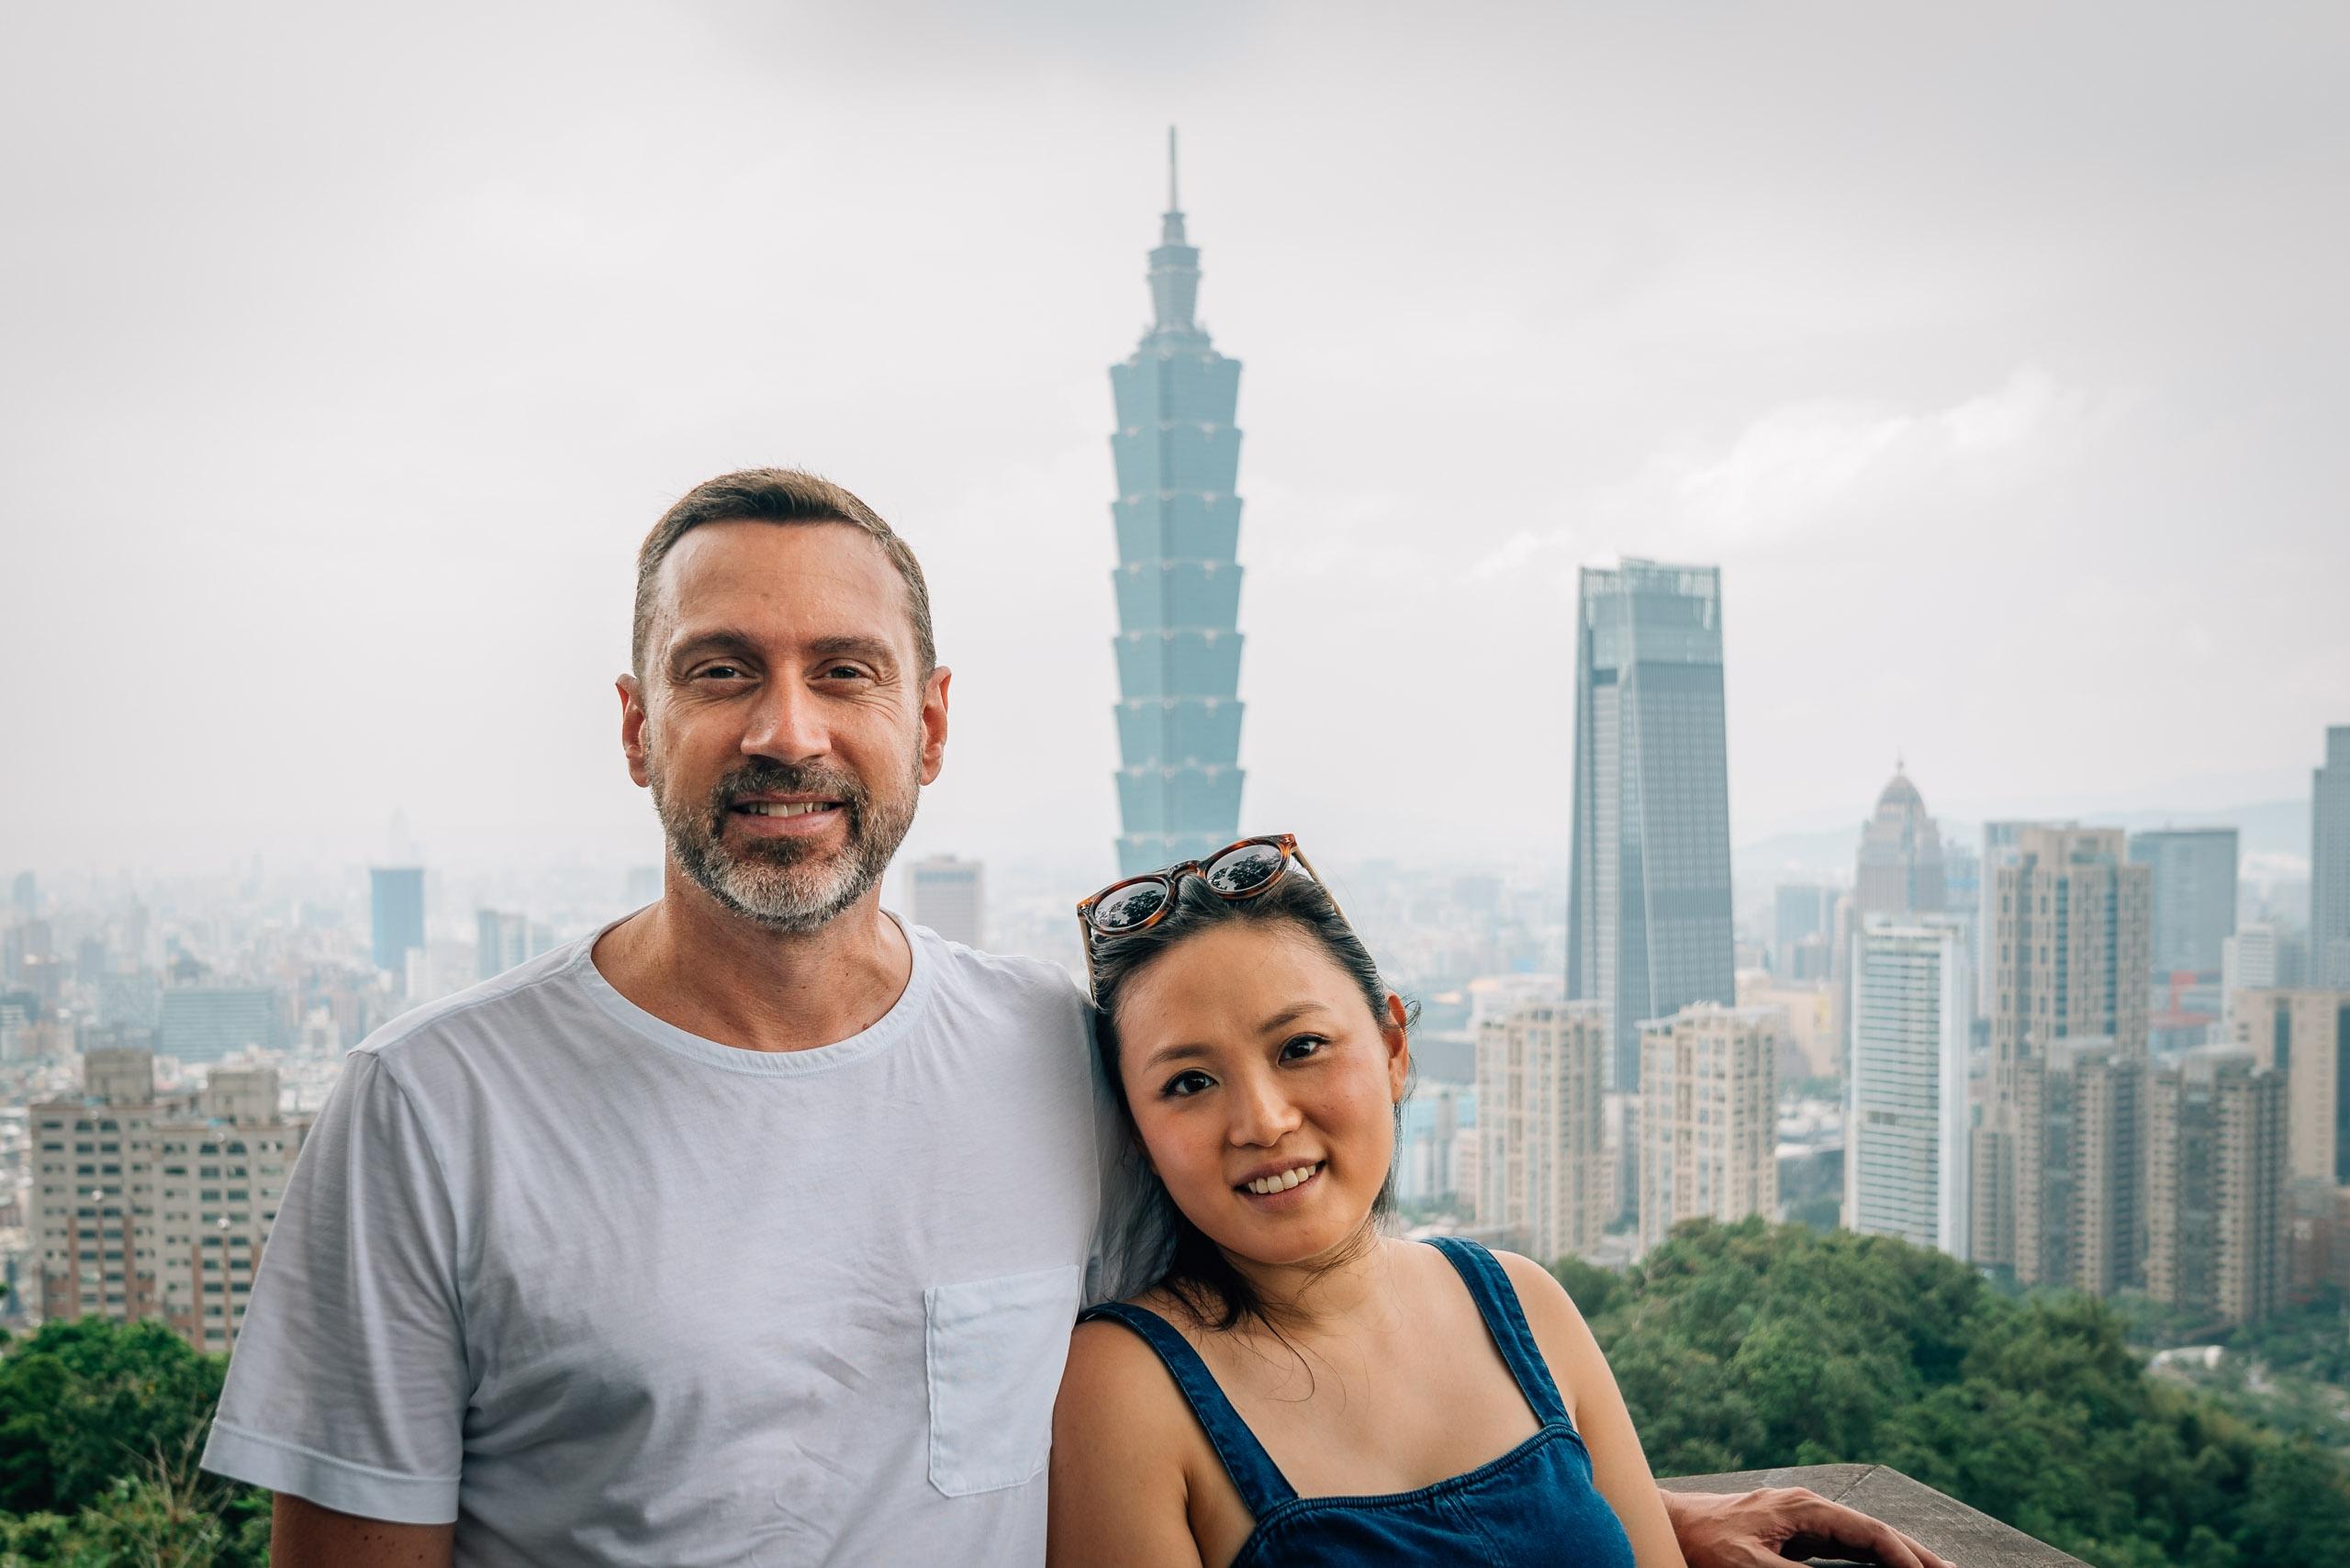 Kris and Jessica overlooking Taipei 101